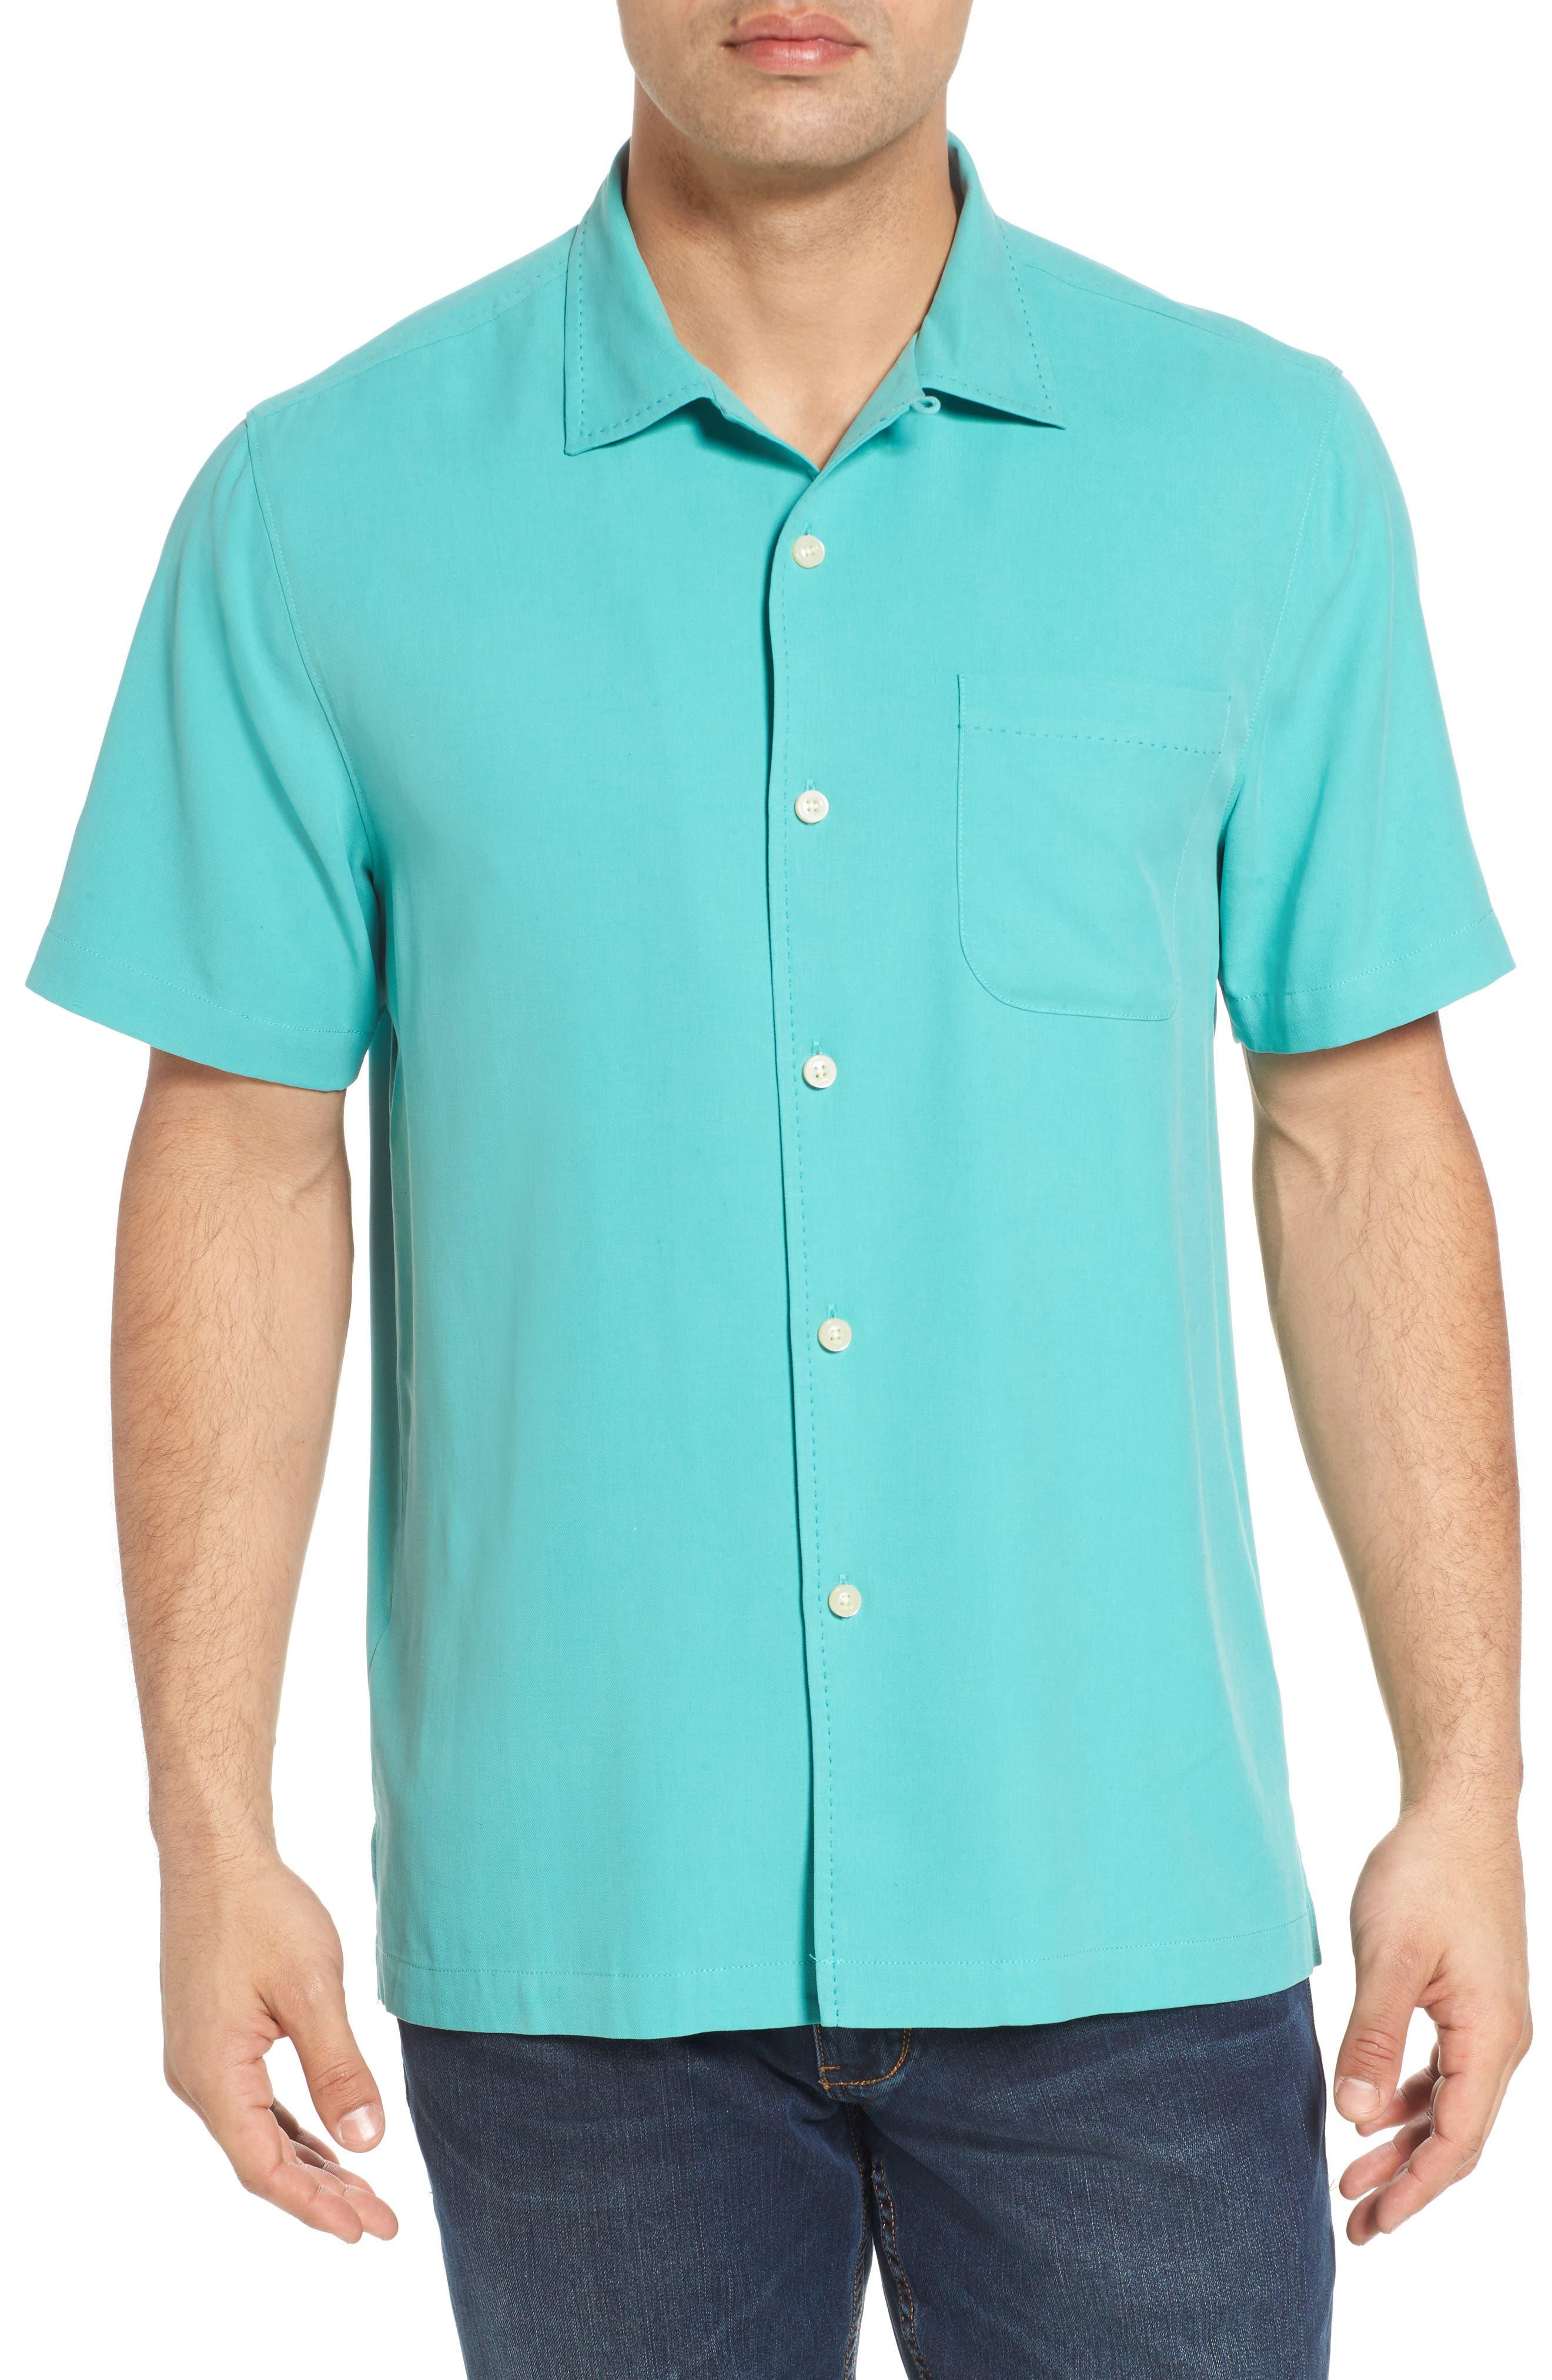 Catalina Silk Camp Shirt,                             Main thumbnail 1, color,                             Castaway Green